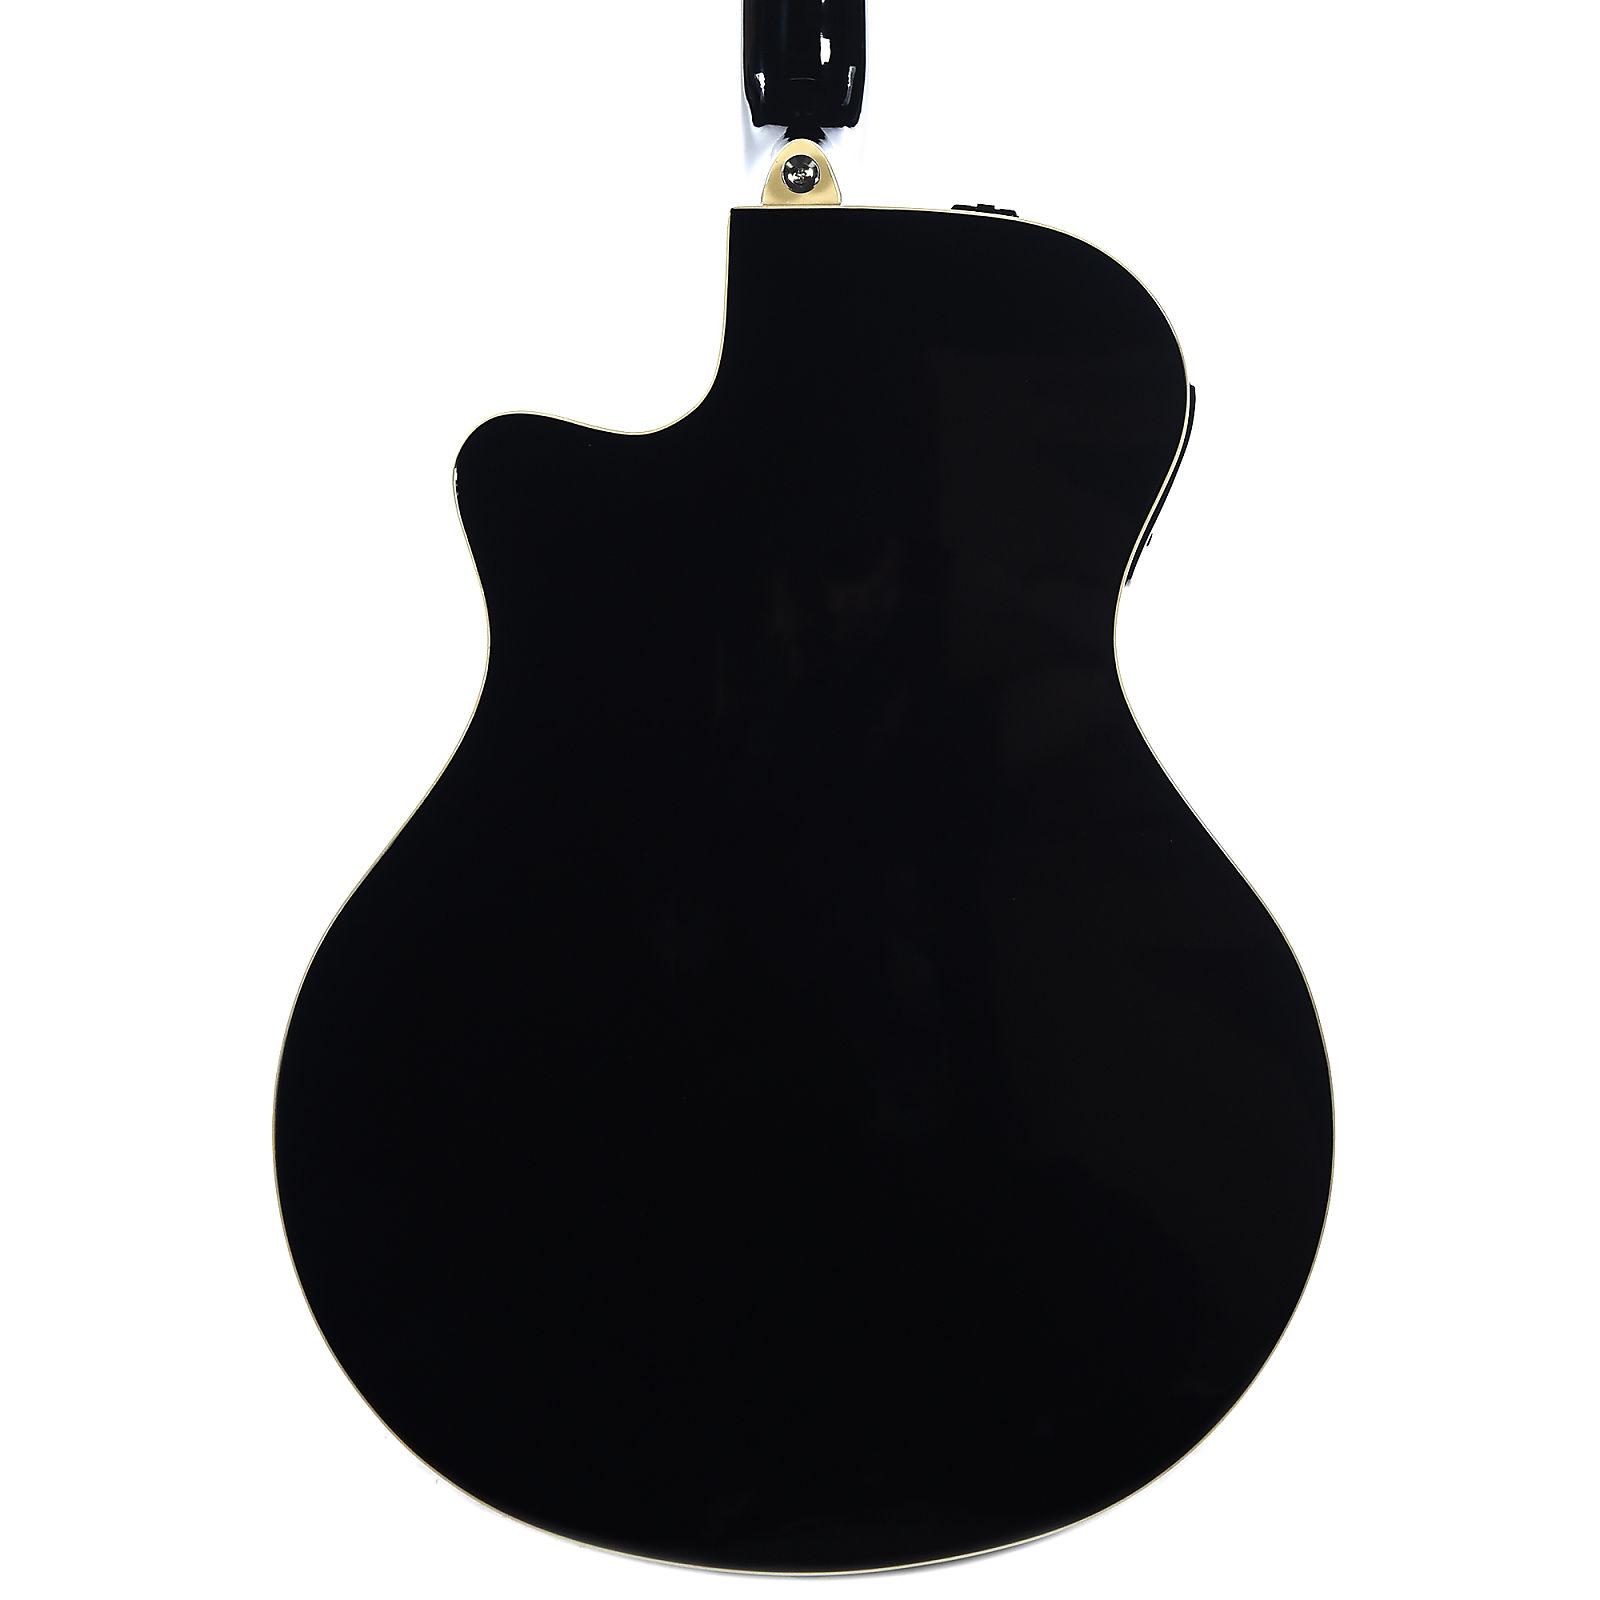 Yamaha Apx600 Thinline Acoustic Electric Guitar Black